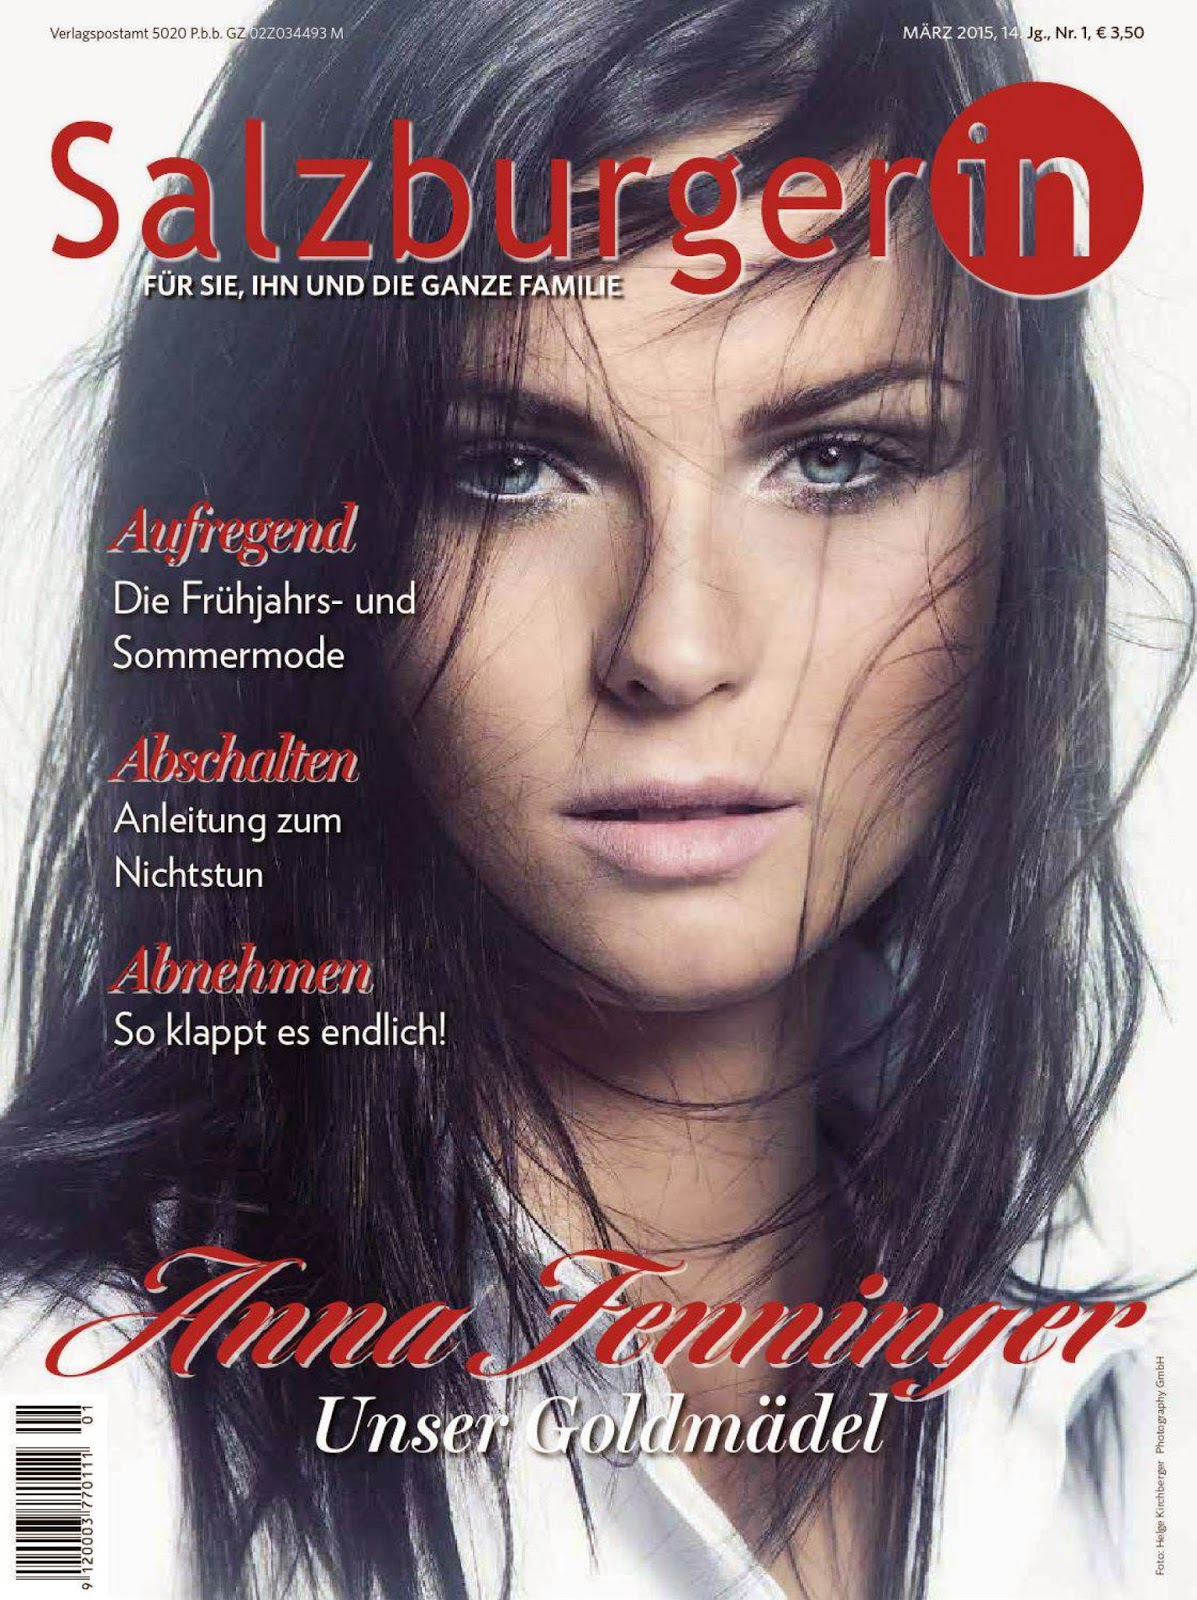 Ski racing,World Cup alpine ski racer and Olympic gold medalist: Anna Fenninger - Salzburgerin  Austria, March 2015